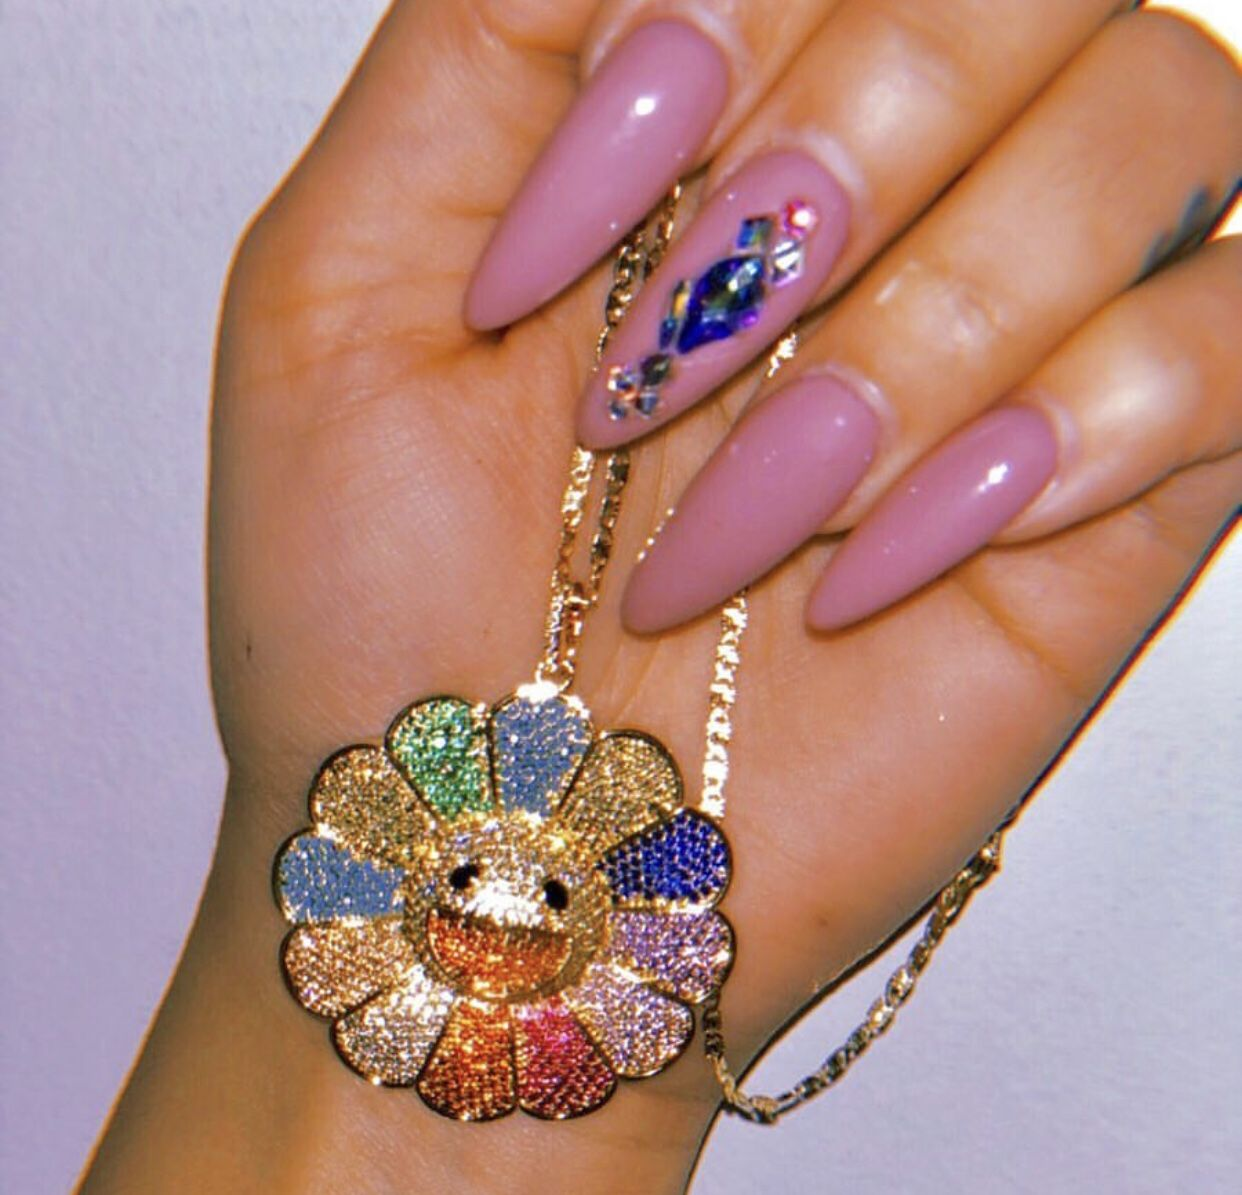 Pin by 𝓷𝓲𝓸𝓶𝓲 on bling Jewelry, Murakami flower, Flower